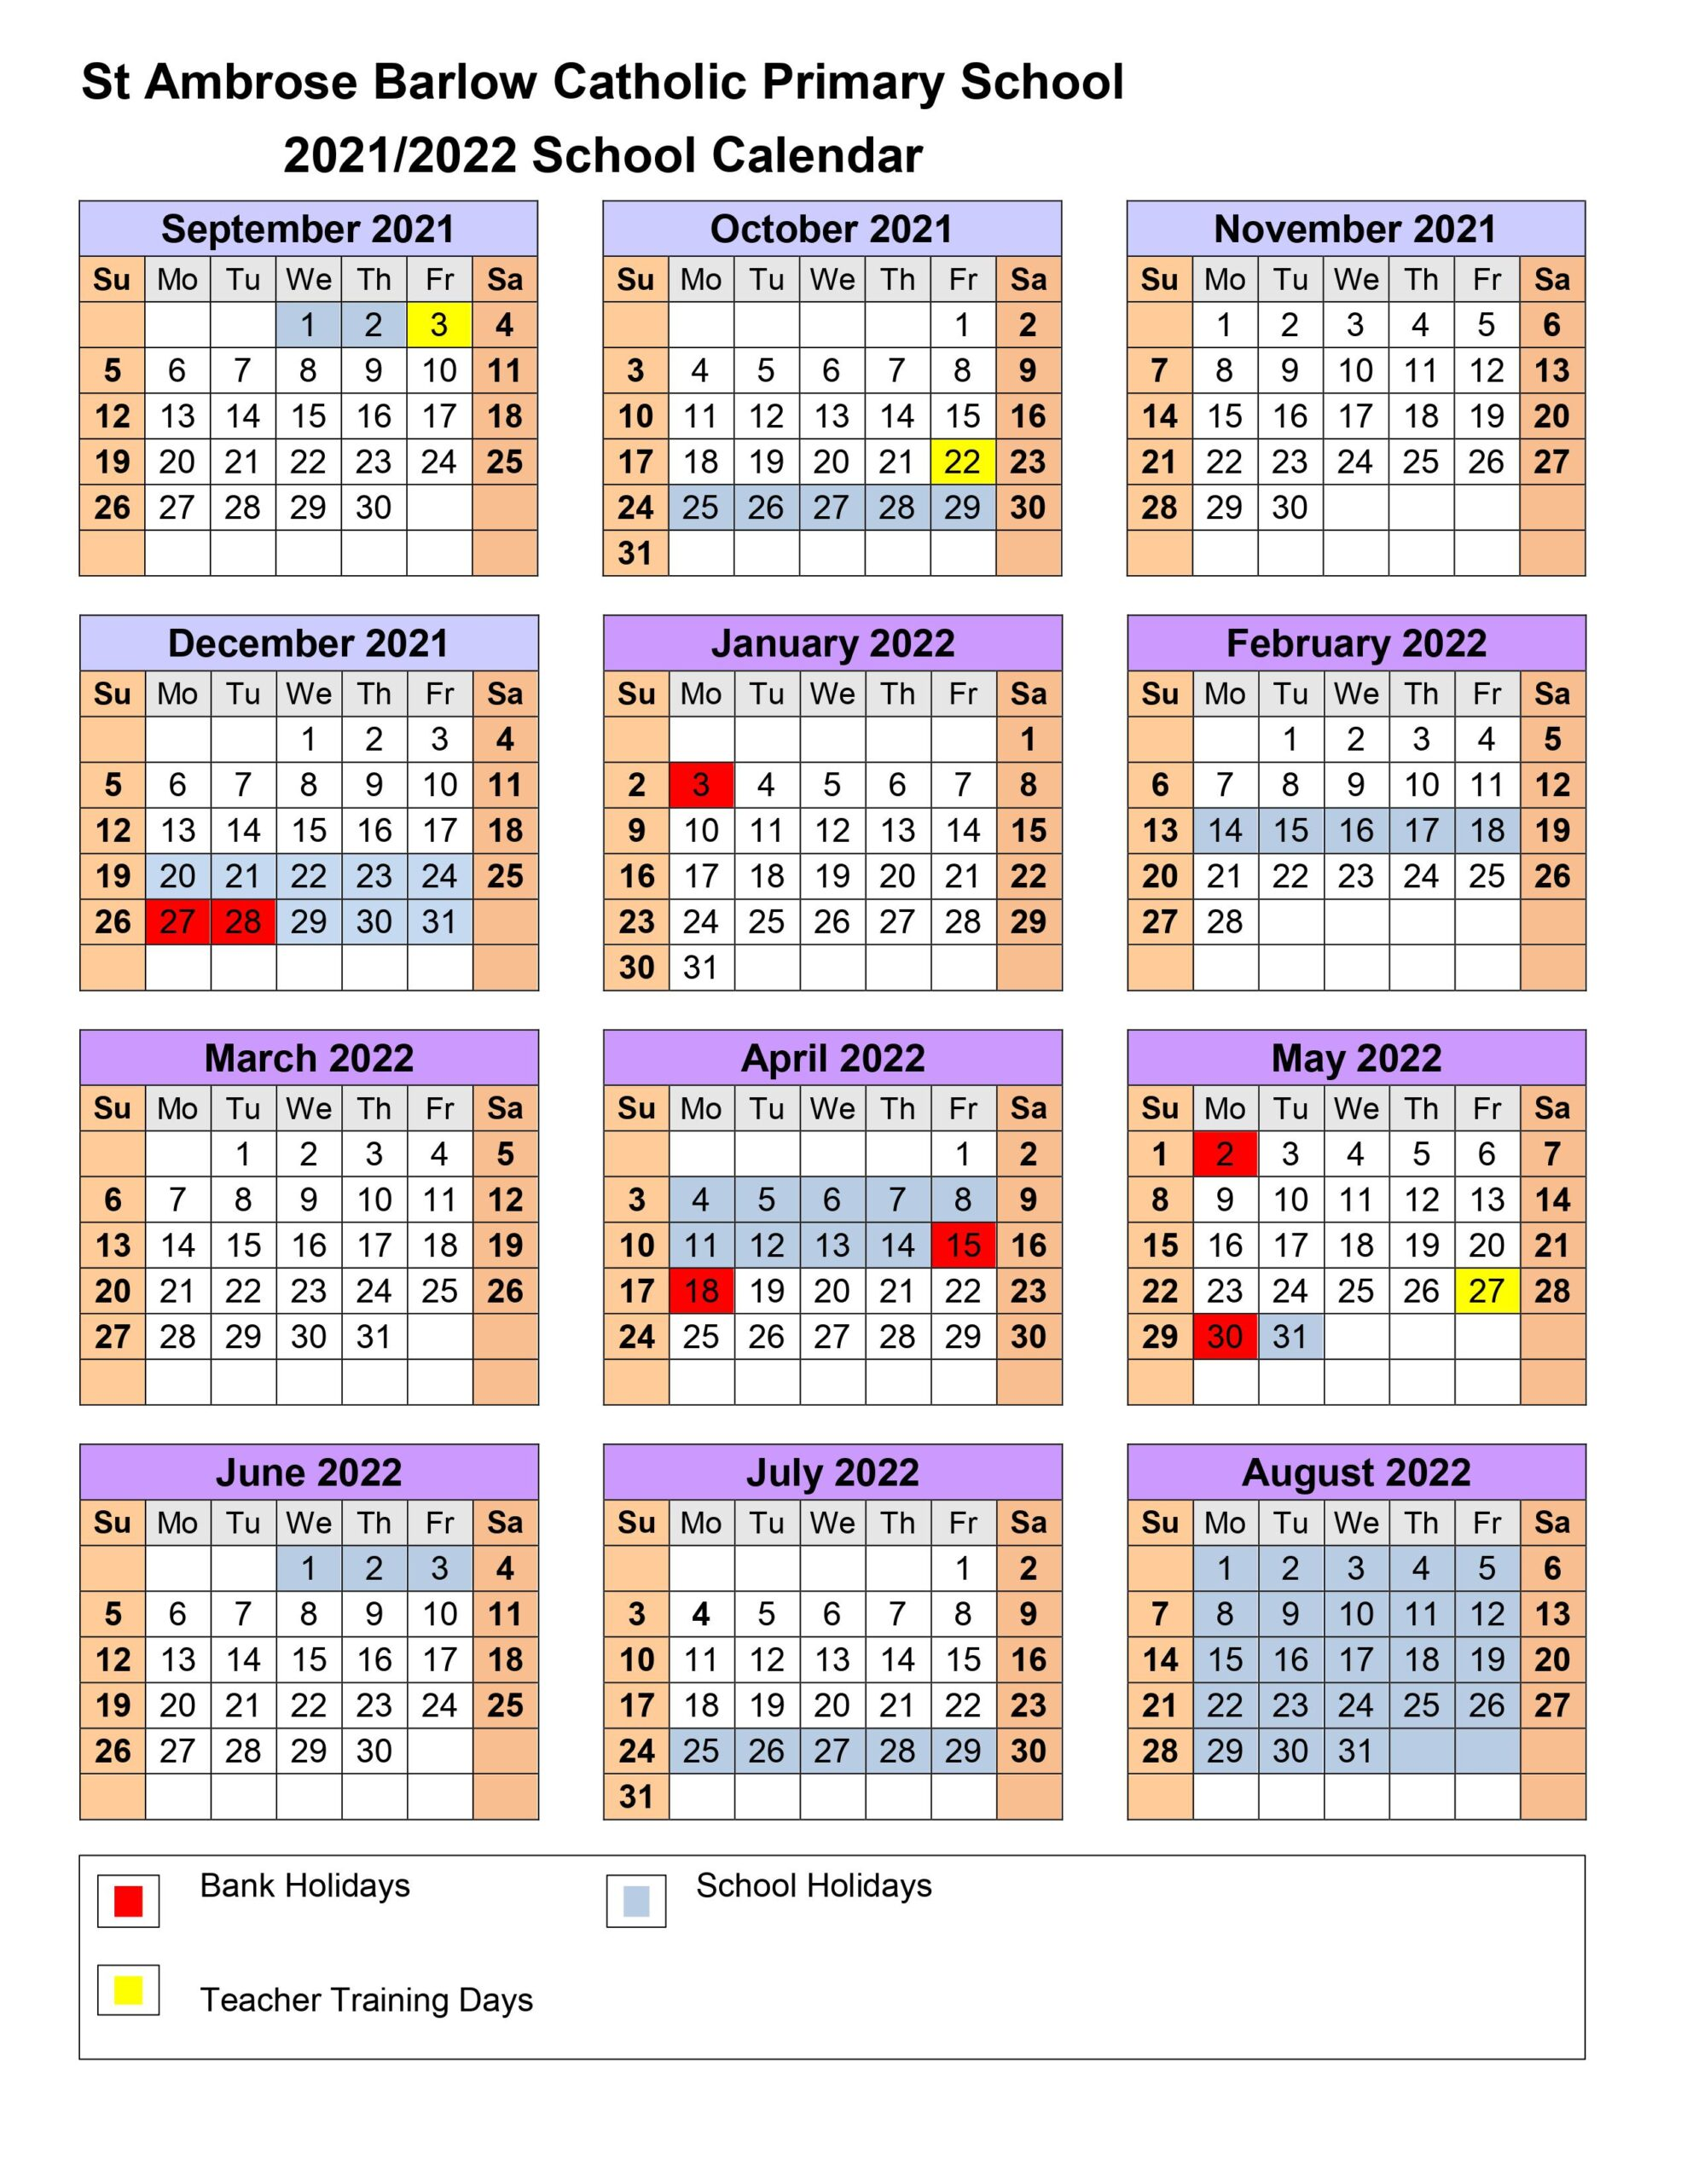 Primary Calendar 2022.Calendar 2021 2022 St Ambrose Barlow Catholic Primary School